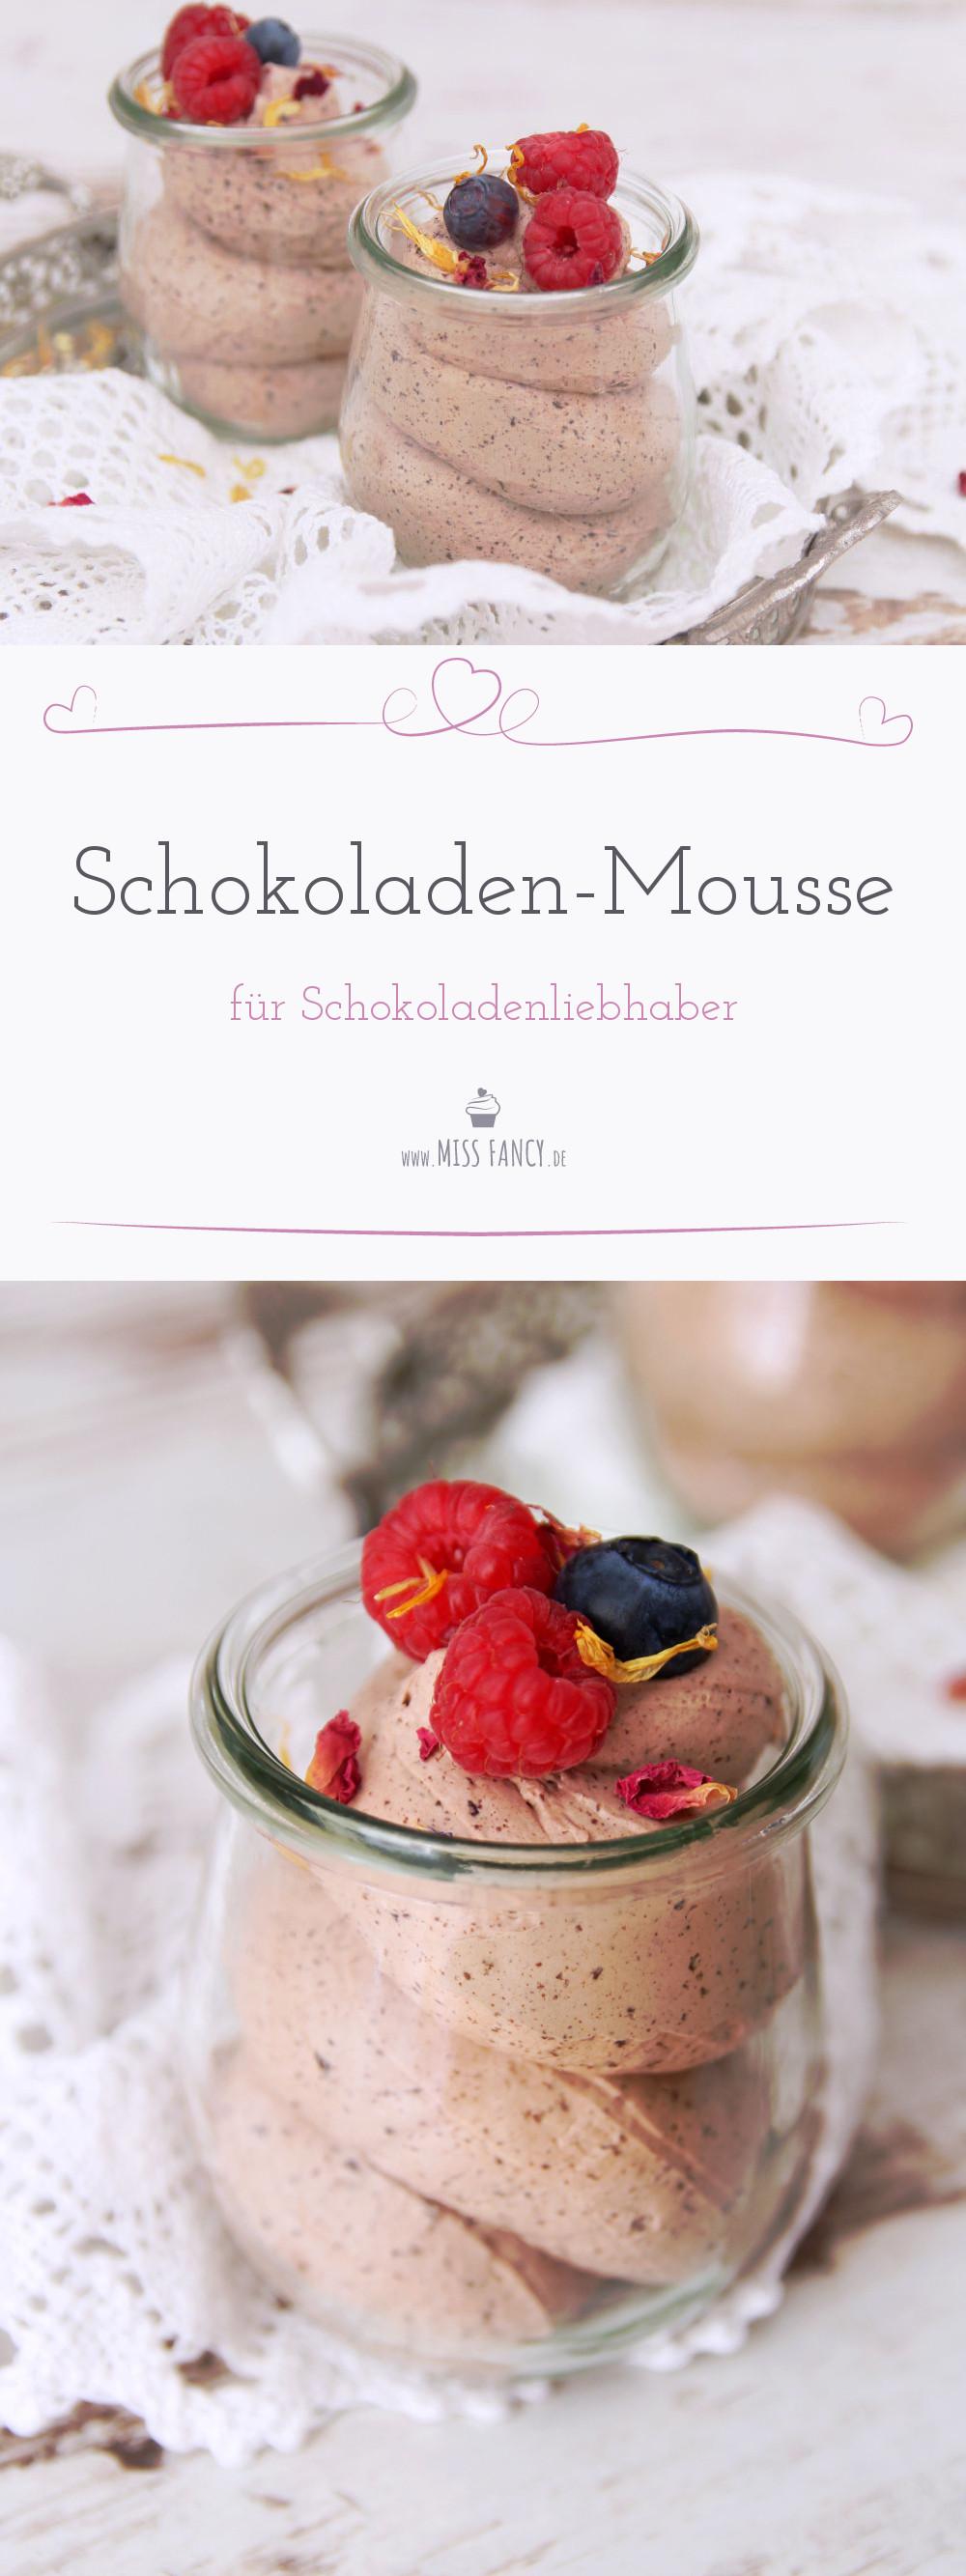 Rezept Schokoladen Mousse Missfancy Foodblog5